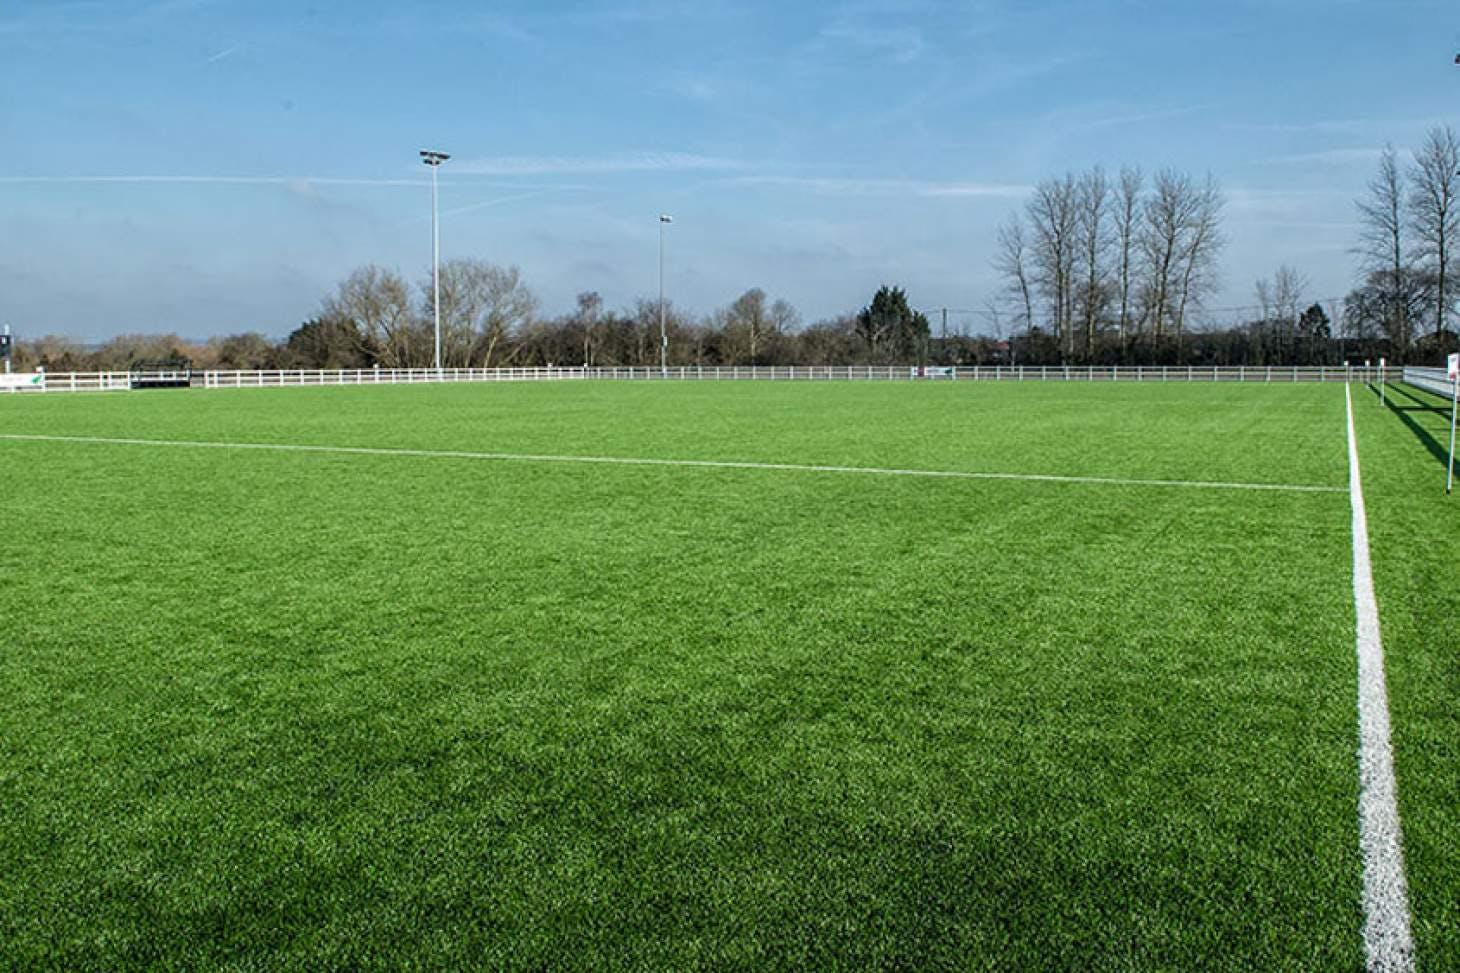 PlayFootball Horsham 5 a side | 3G Astroturf football pitch